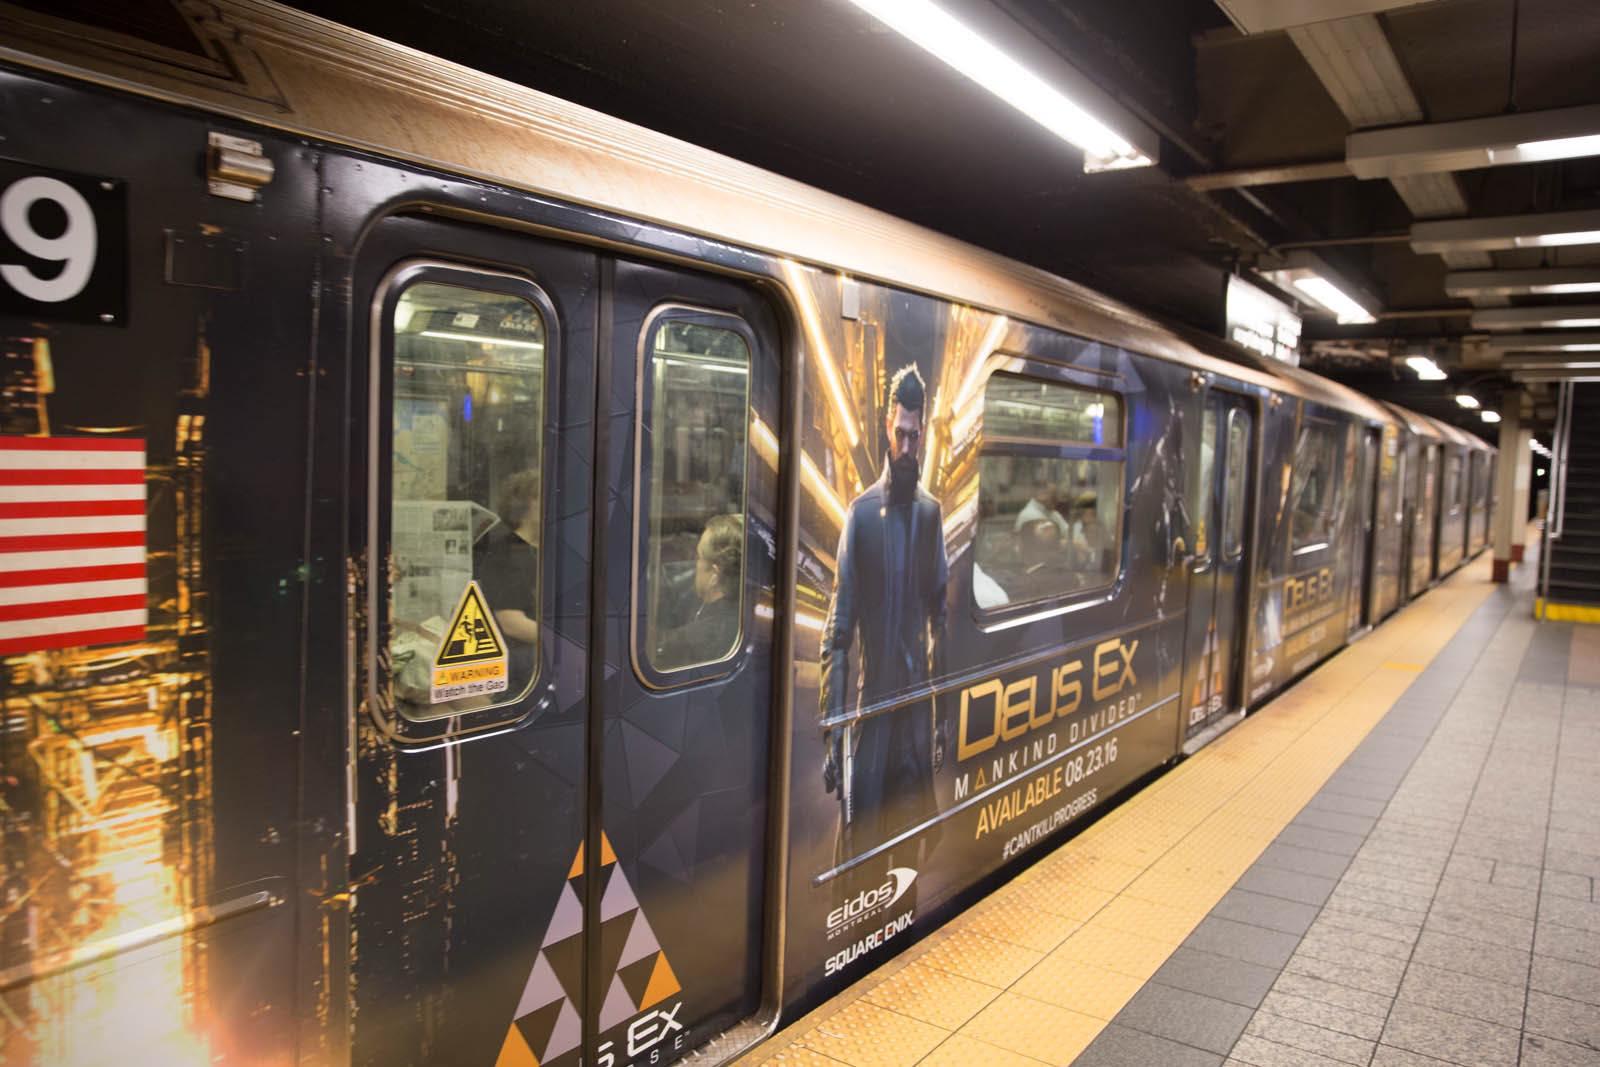 New Yorkem se prohání vlak metra s motivy Deus Ex: Mankind Divided 128575